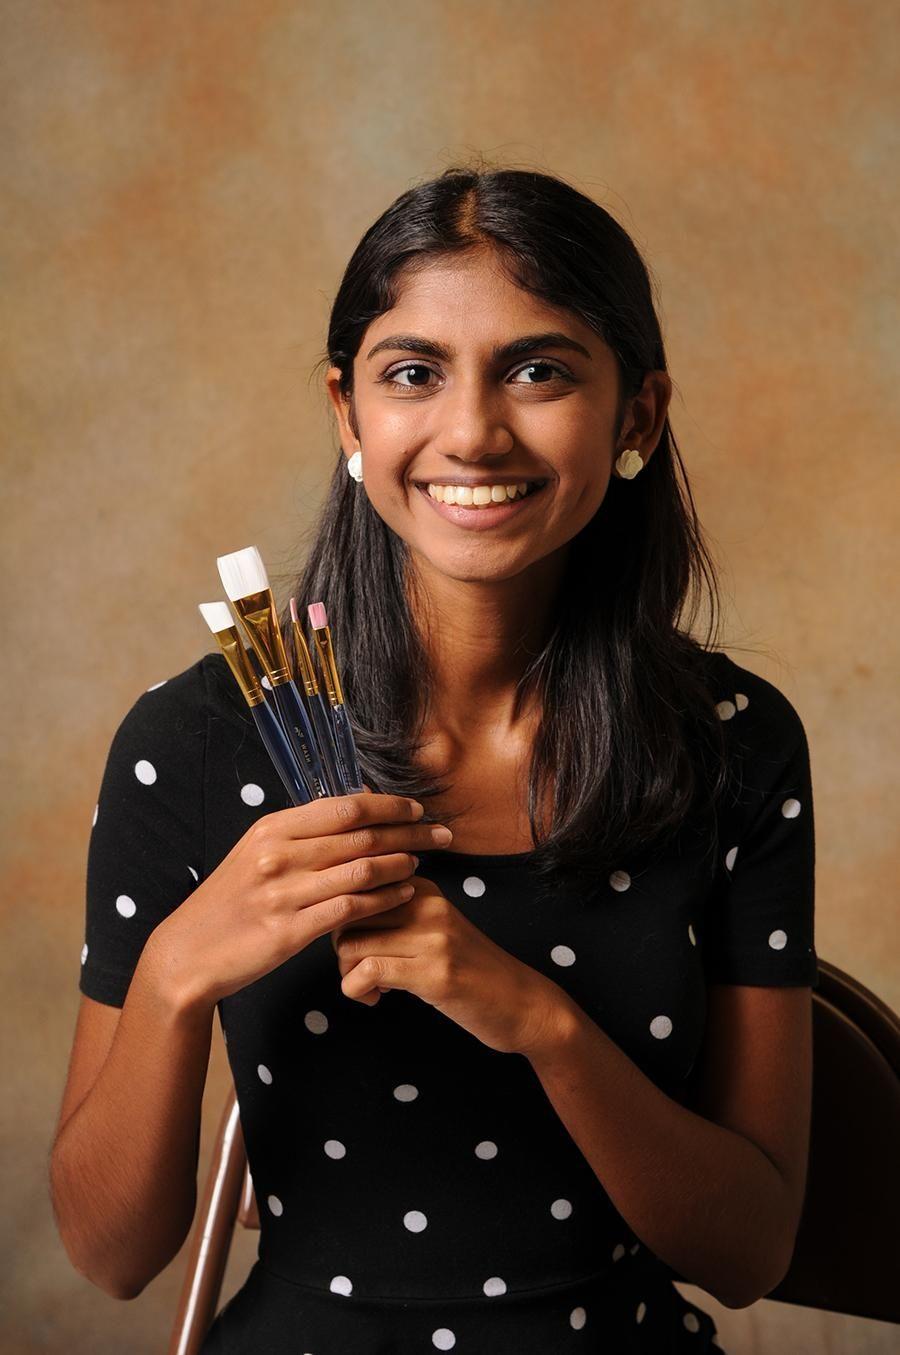 Floral Park High School's Meena Natarajan finds her